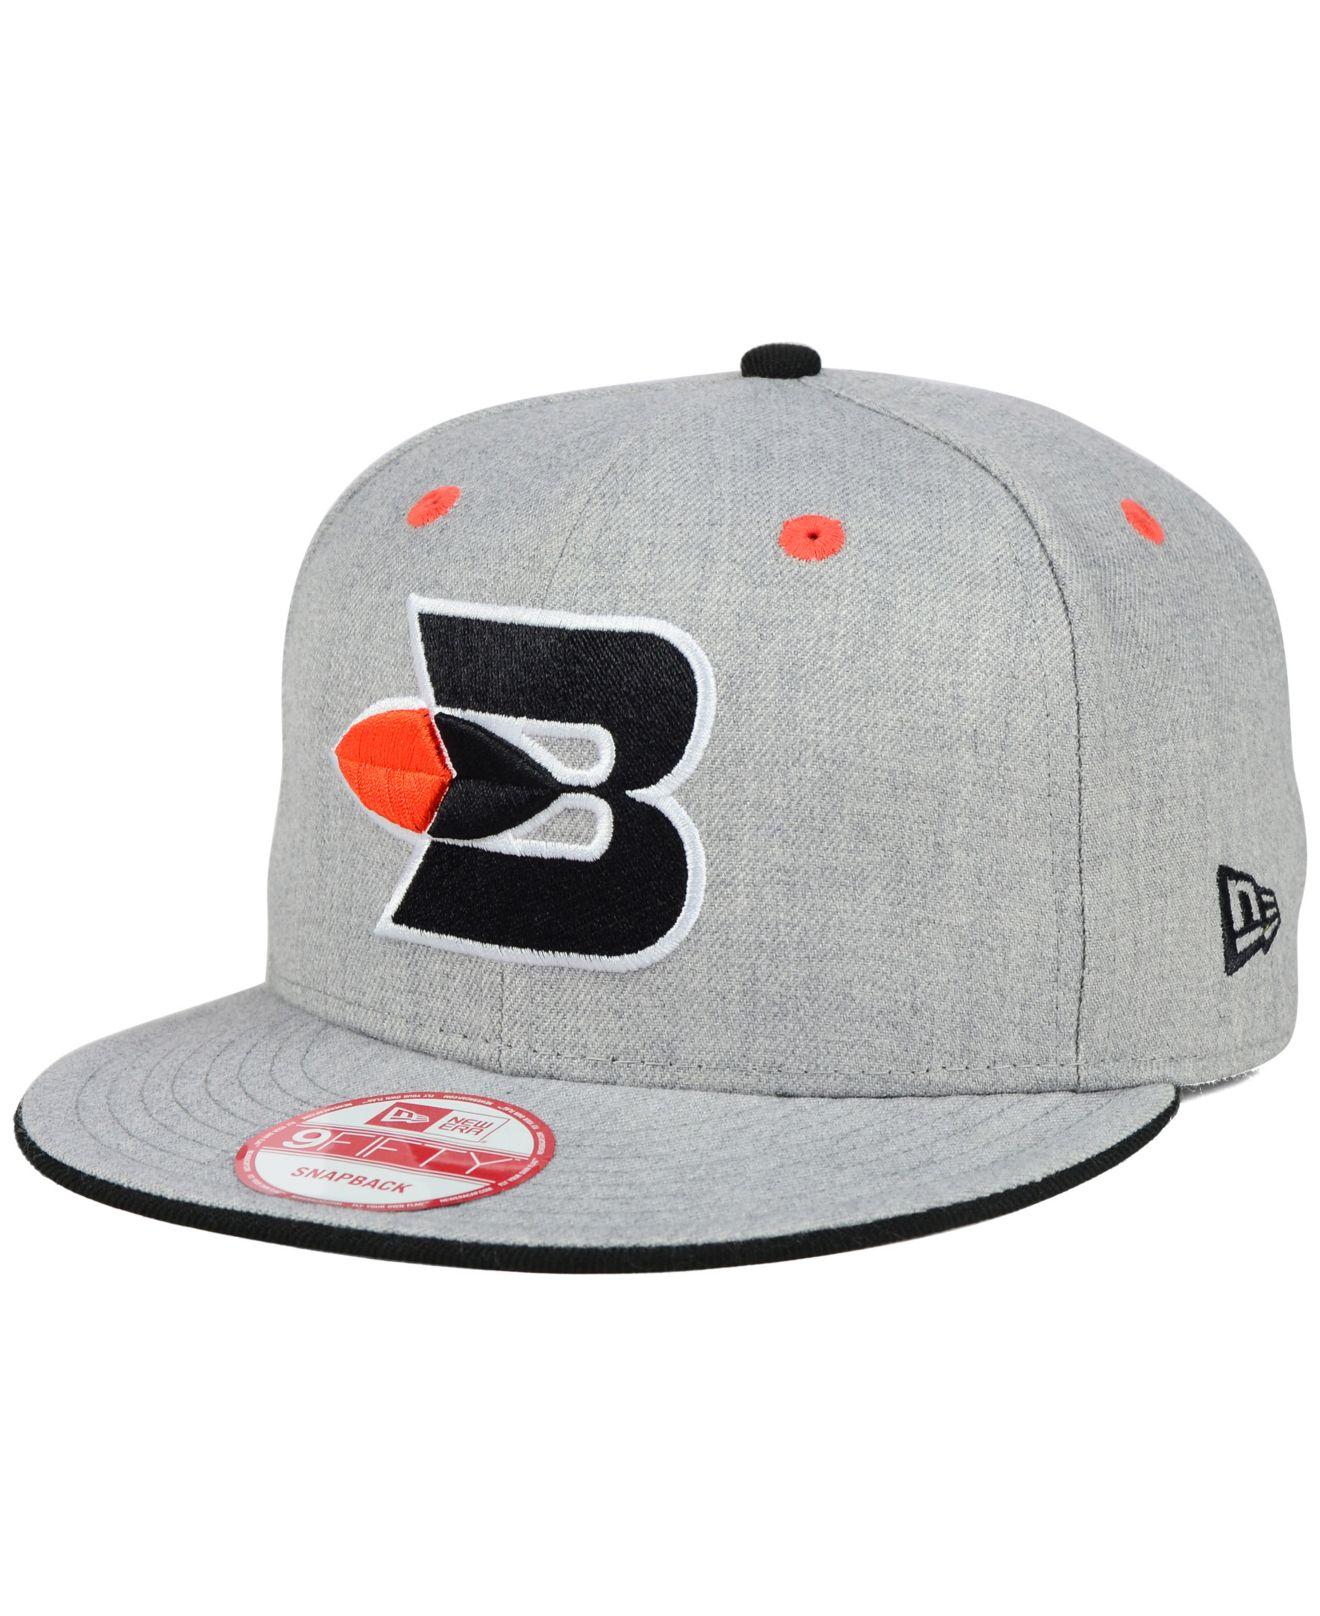 reputable site b5b12 85929 ... ireland lyst ktz buffalo braves heather 9fifty snapback cap in gray for  men e989a 28323